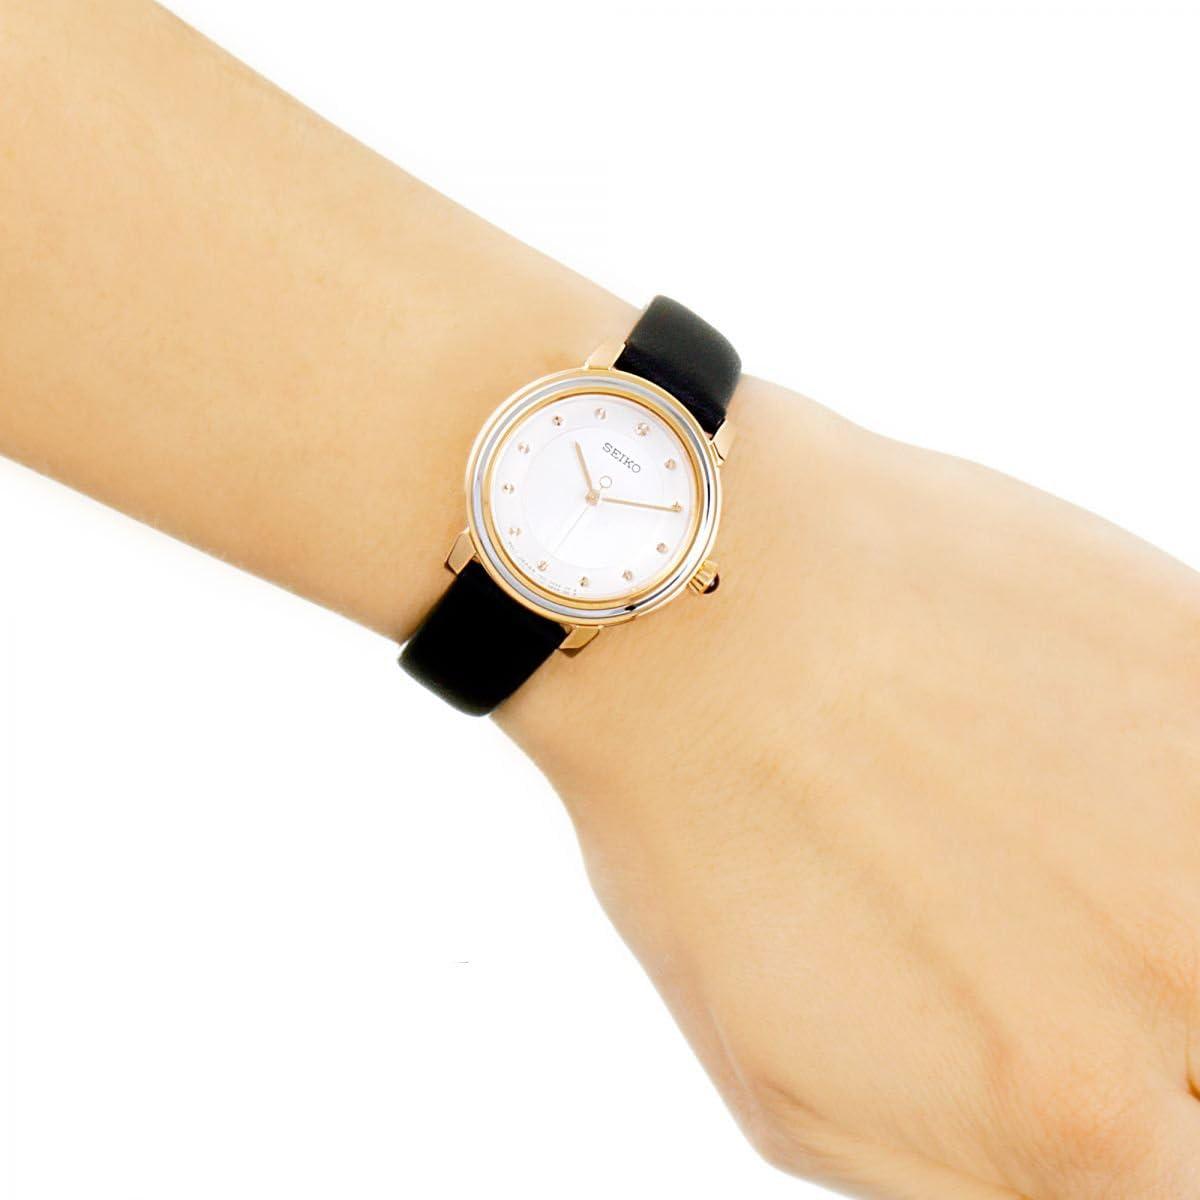 Seiko Women's Watch SRZ482P1 Black